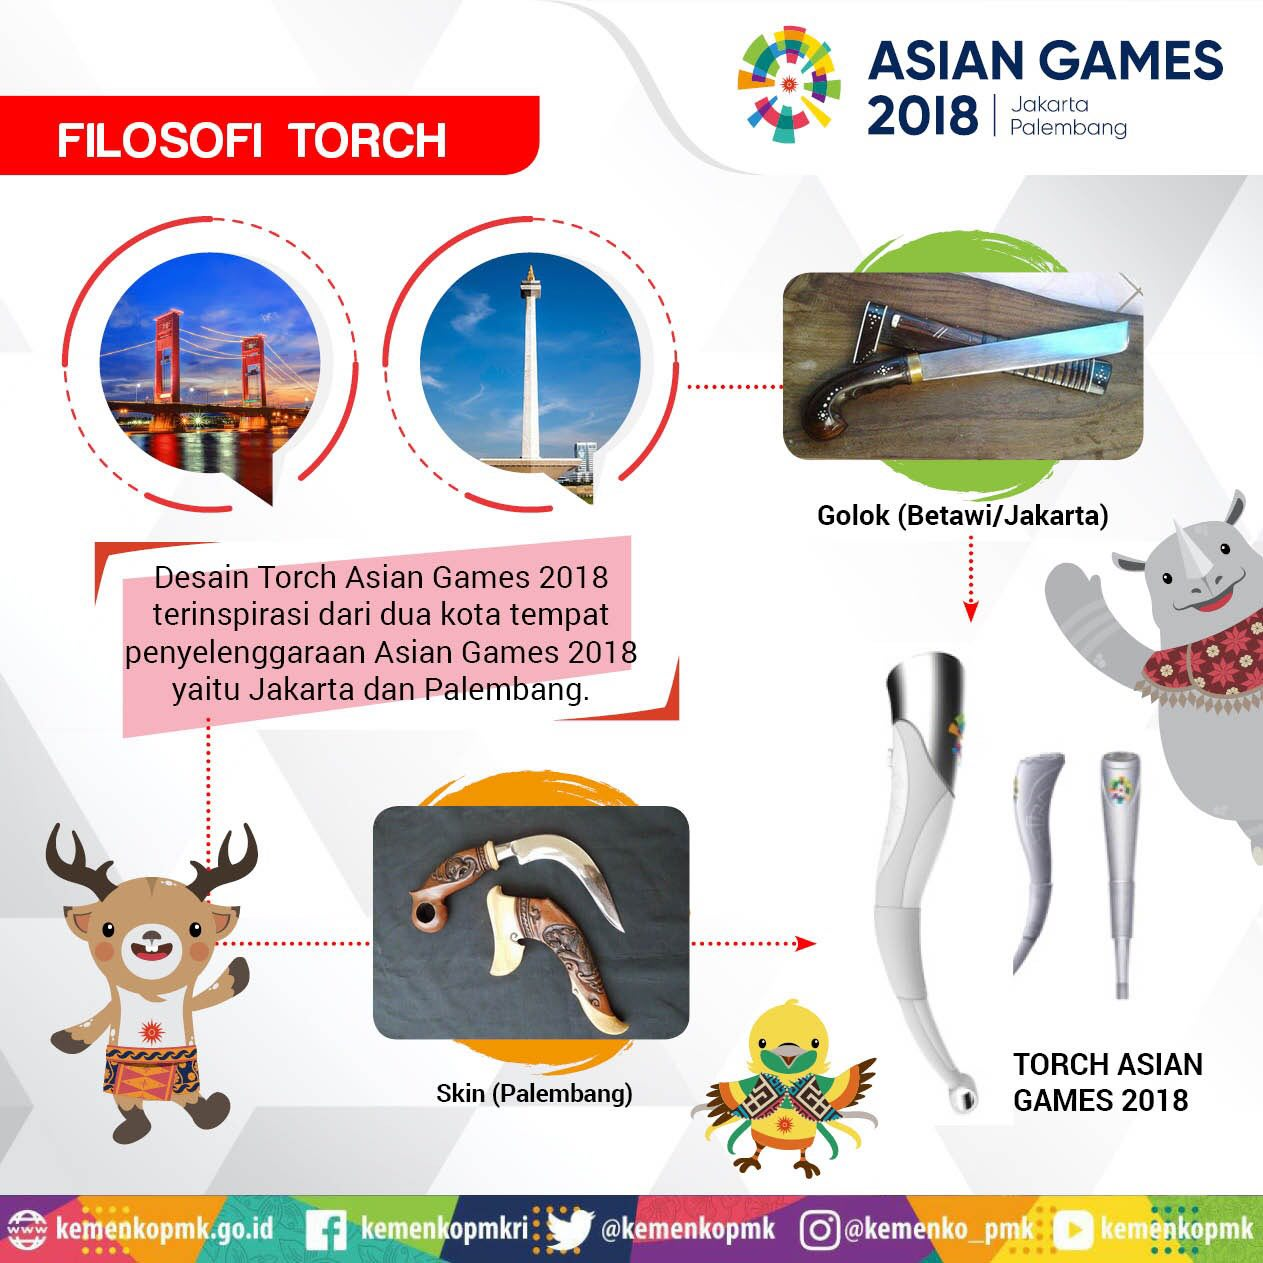 Infografis Kota Pariaman: Filosofi Torch Asian Games 2018